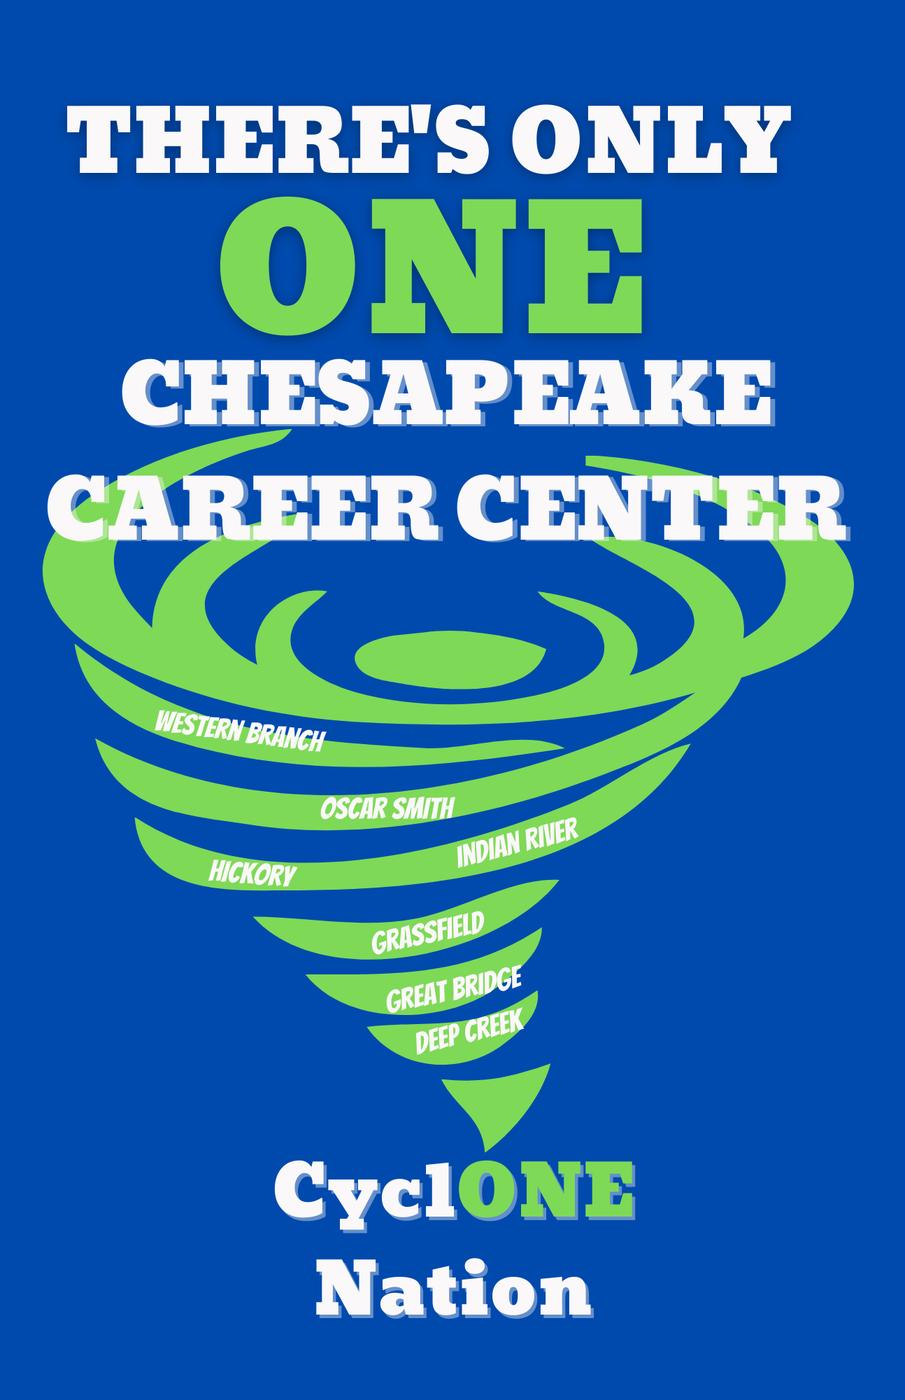 Chesapeake Career Center